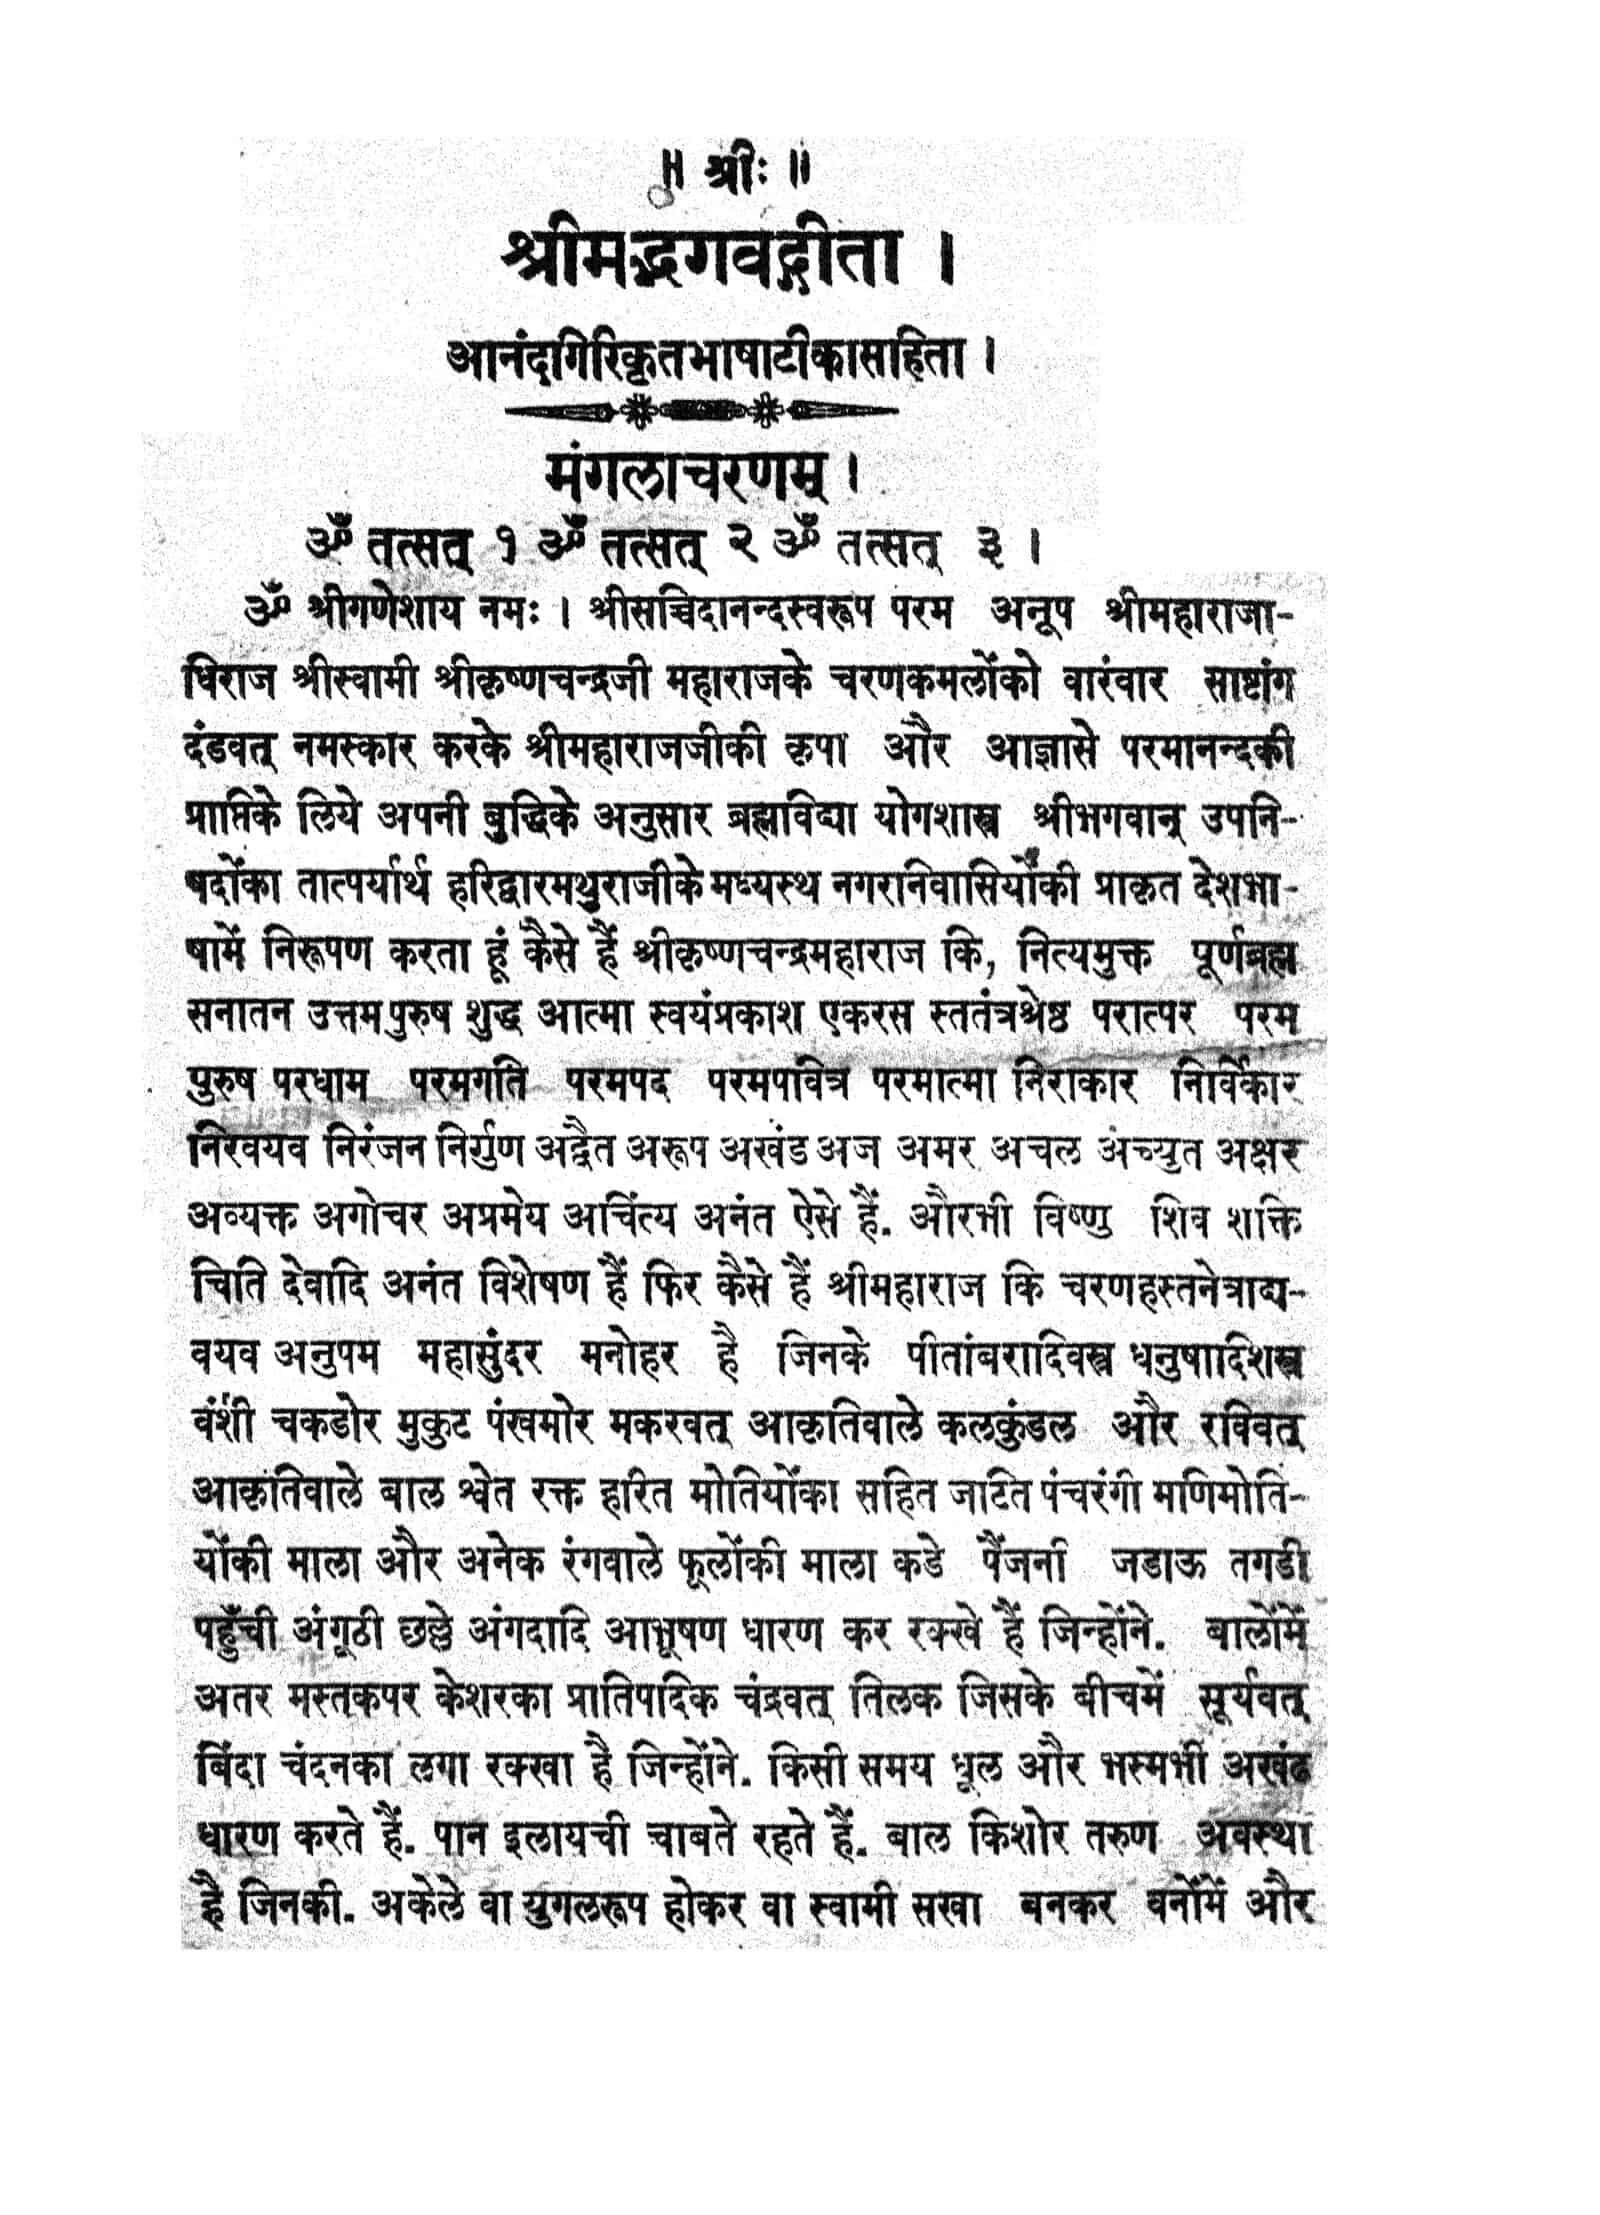 Book Image : श्रीमद्भगवद्गीता  - Shri Madbhagavadgeeta